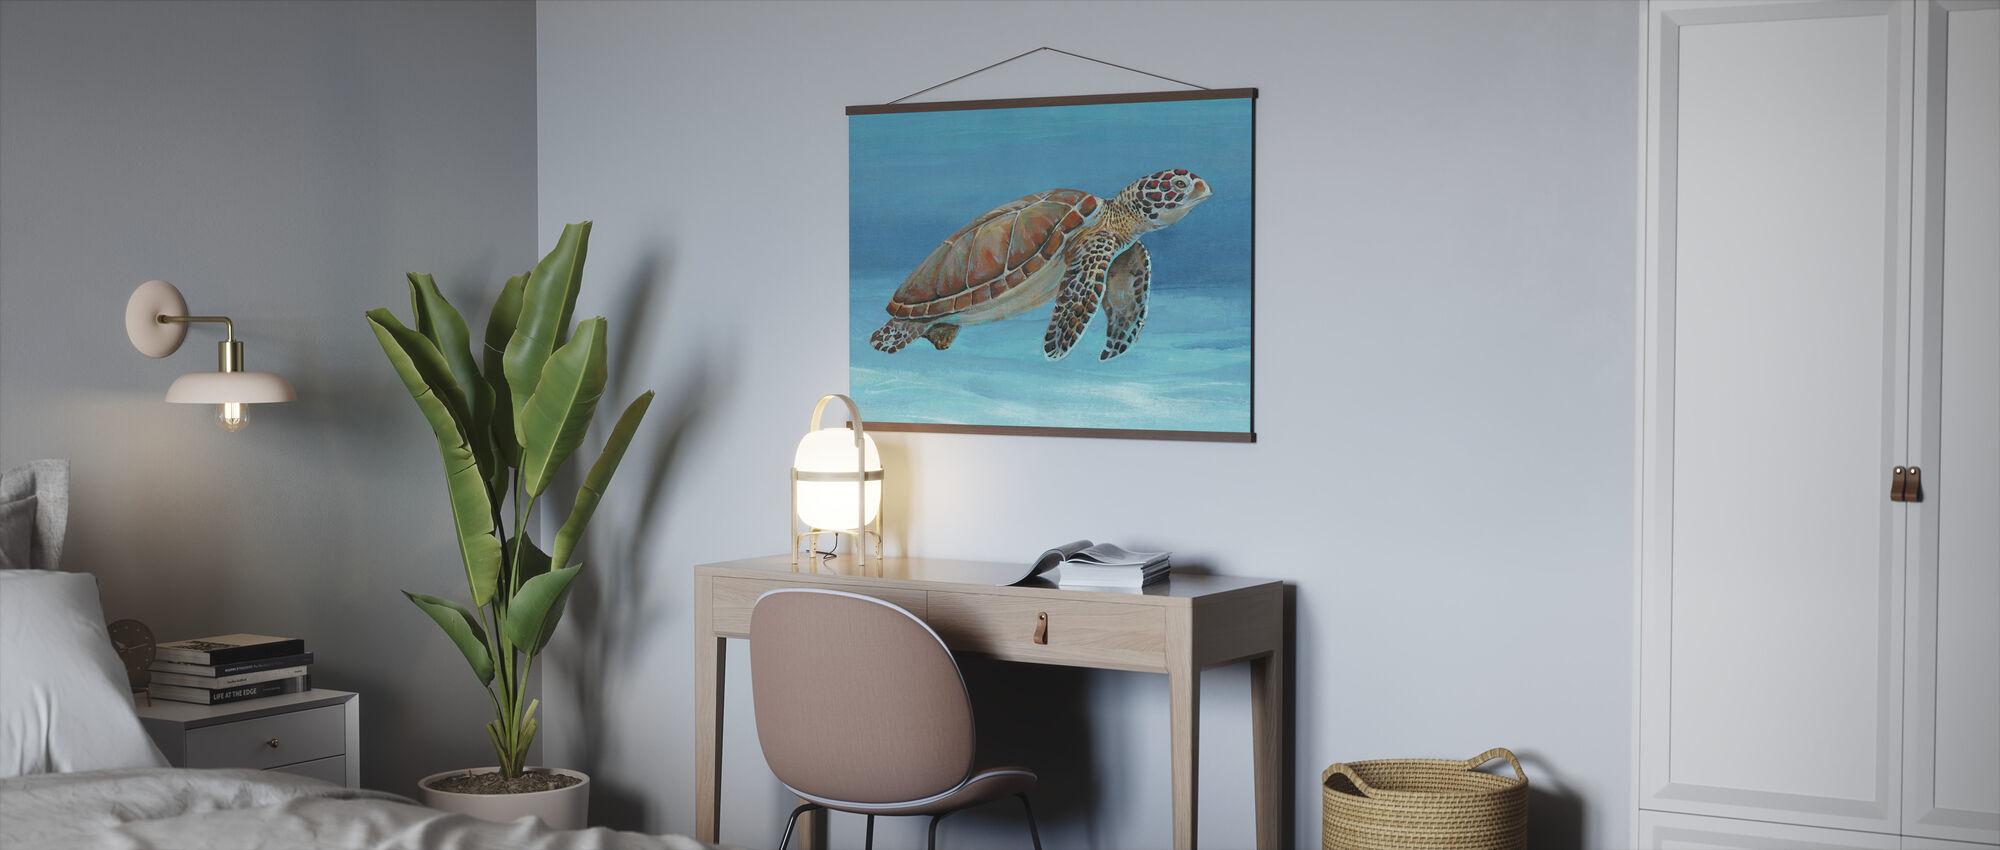 Ocean Sea Turtle - Poster - Office